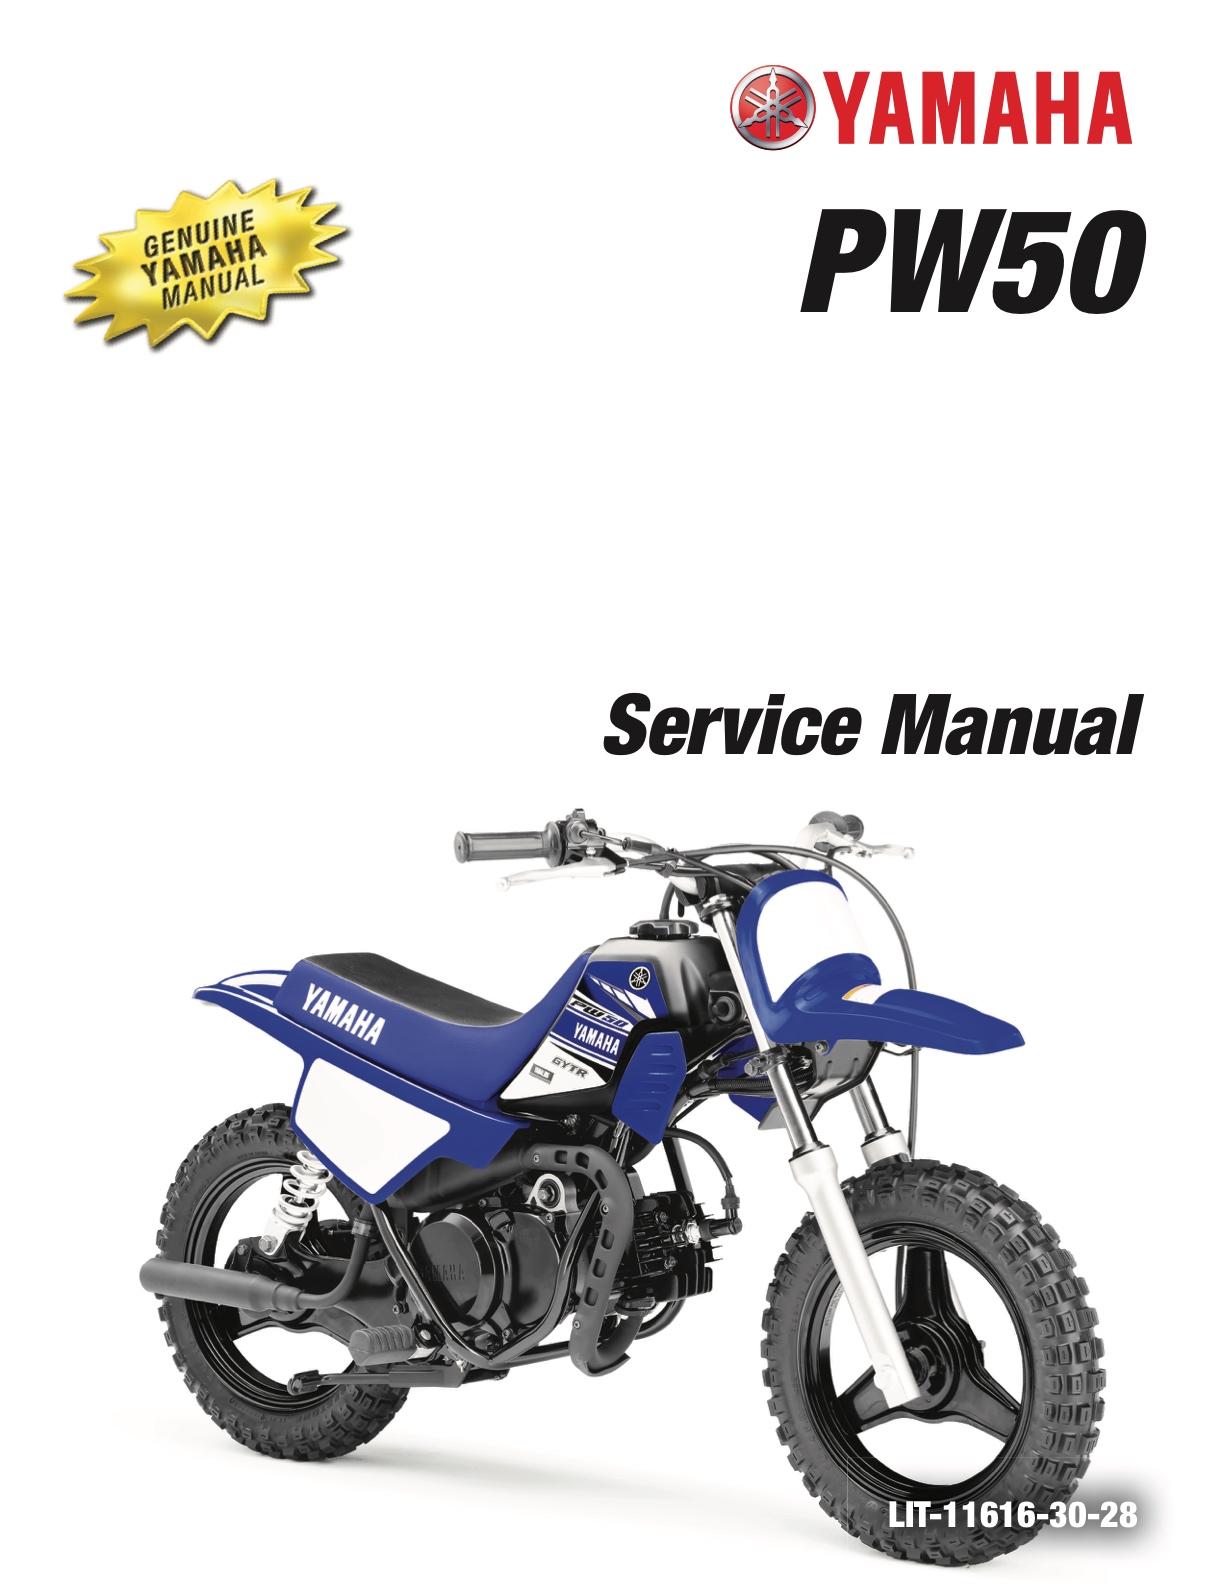 yamaha 2017 2018 pw50 pw50h2 pee wee 50 service manual rh yamaha manuals cc Yamaha Motorcycle Rims Yamaha PW50 Parts